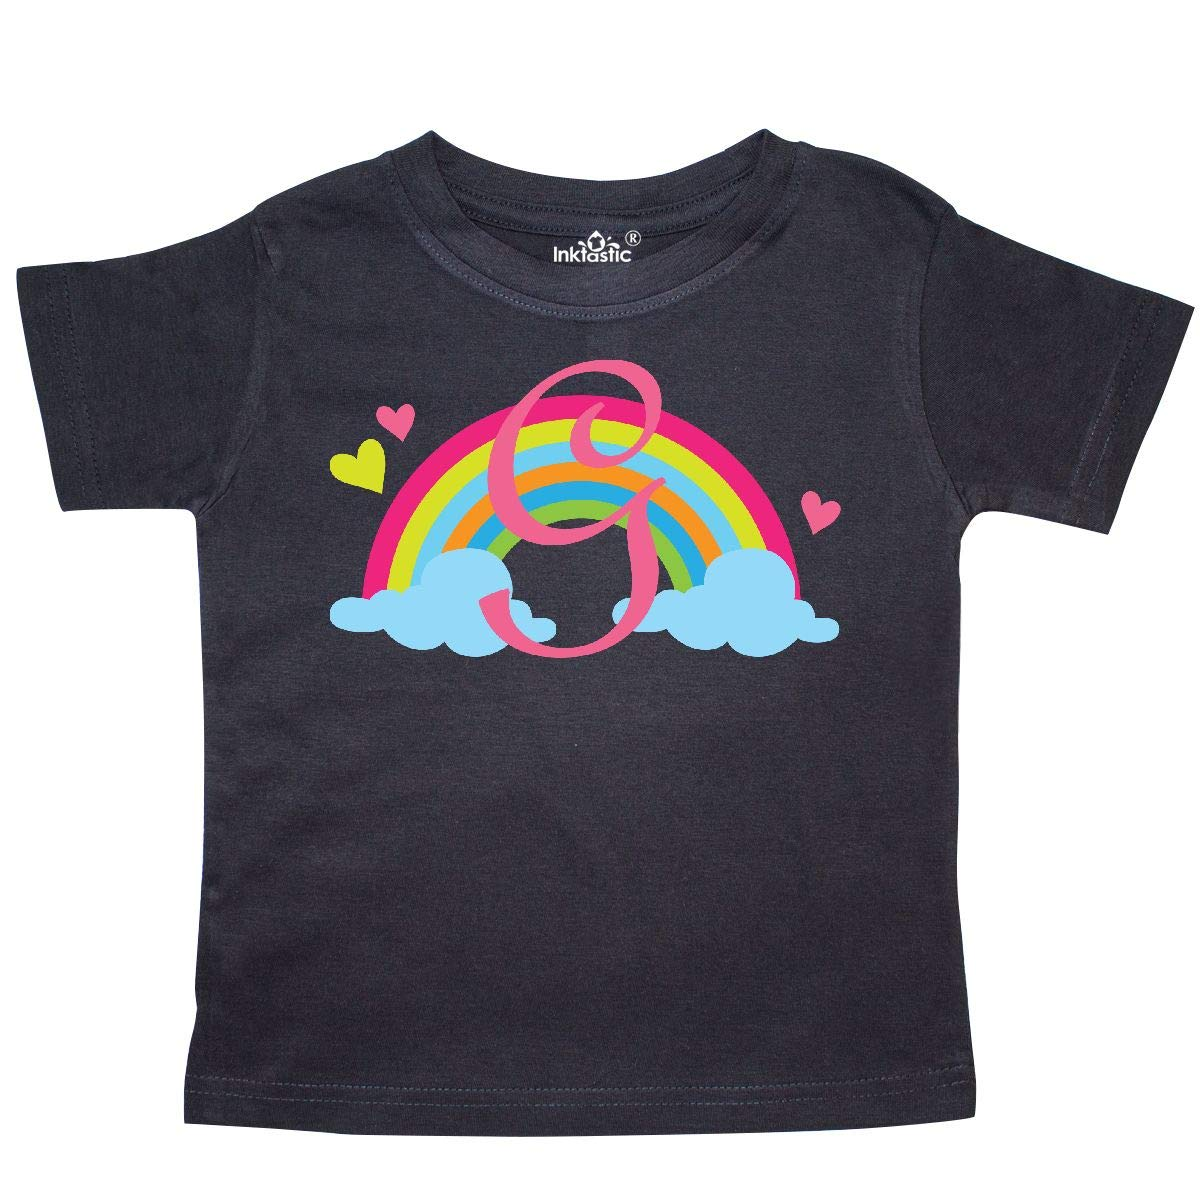 inktastic Monogram Letter G Rainbow Toddler T-Shirt